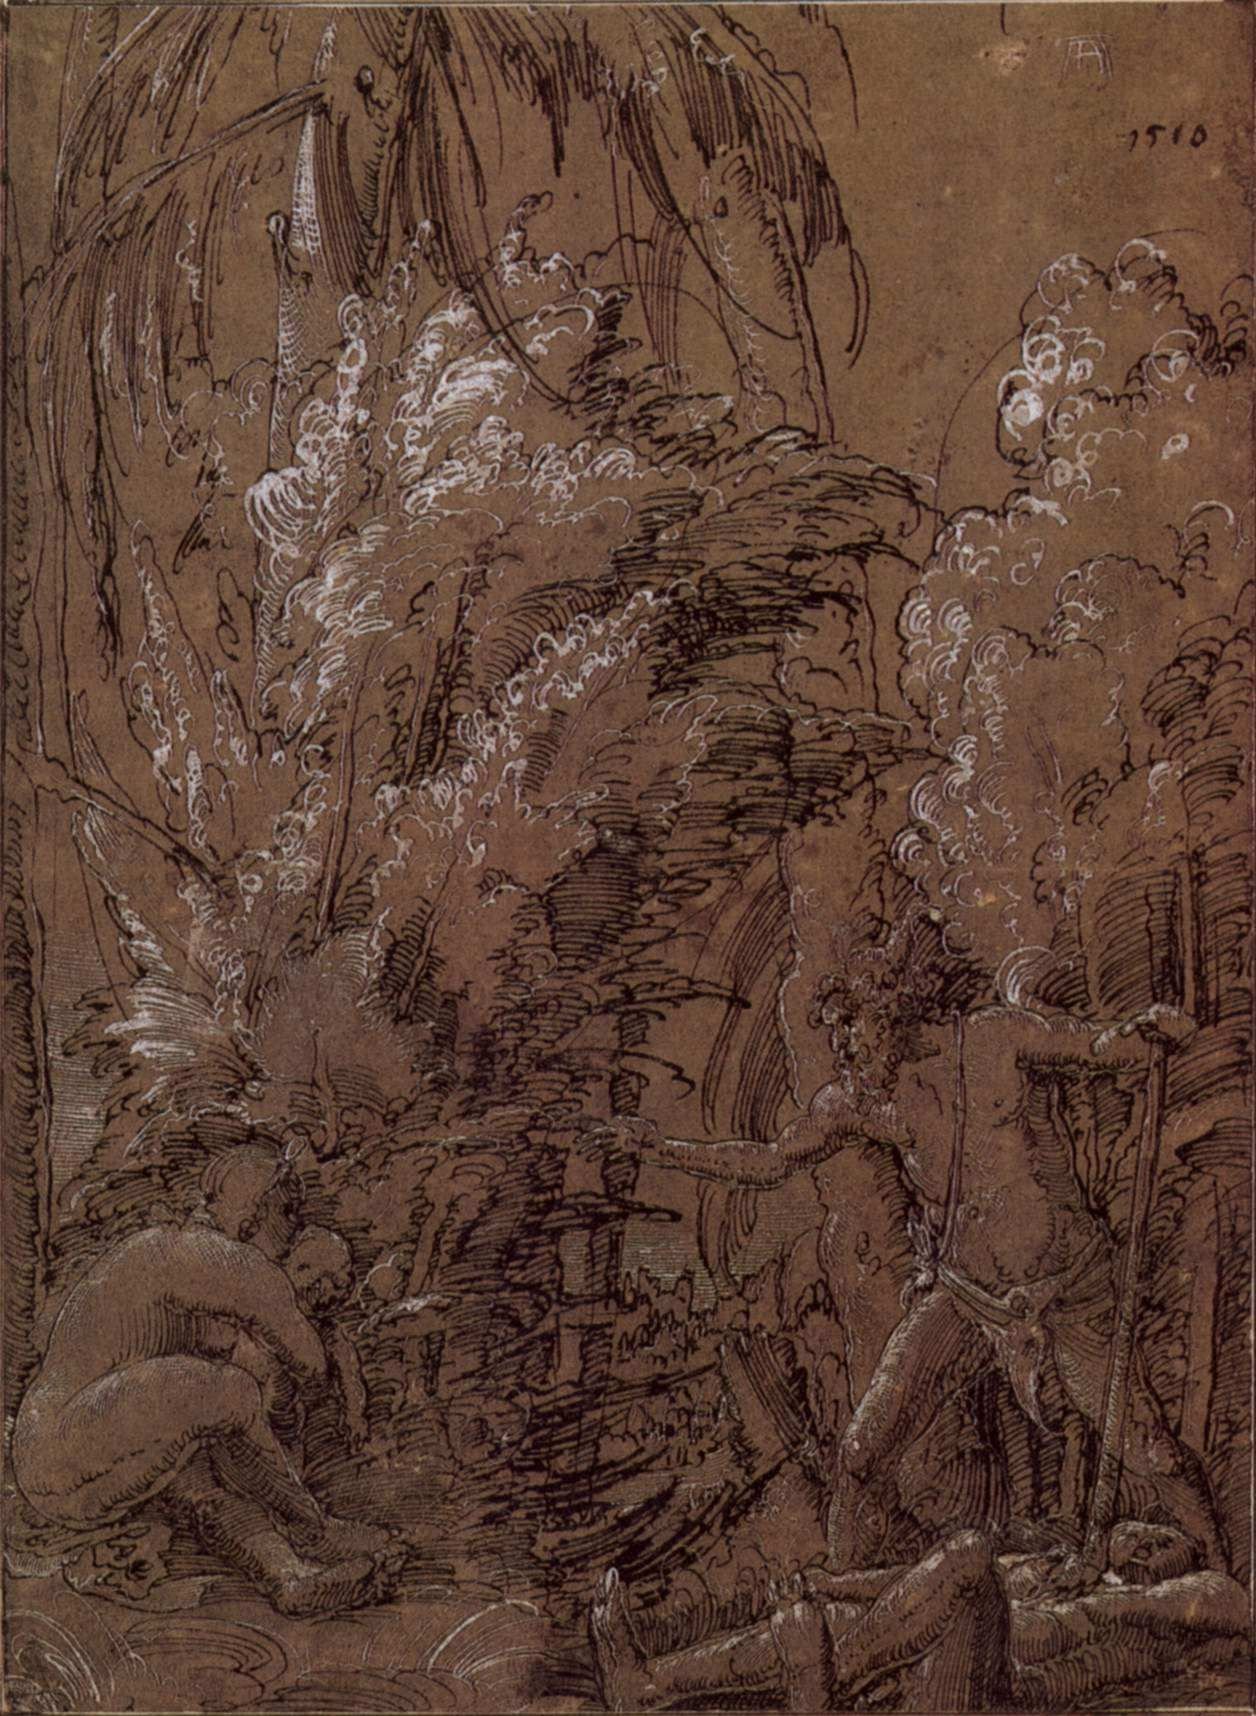 Wild folk family, 1510